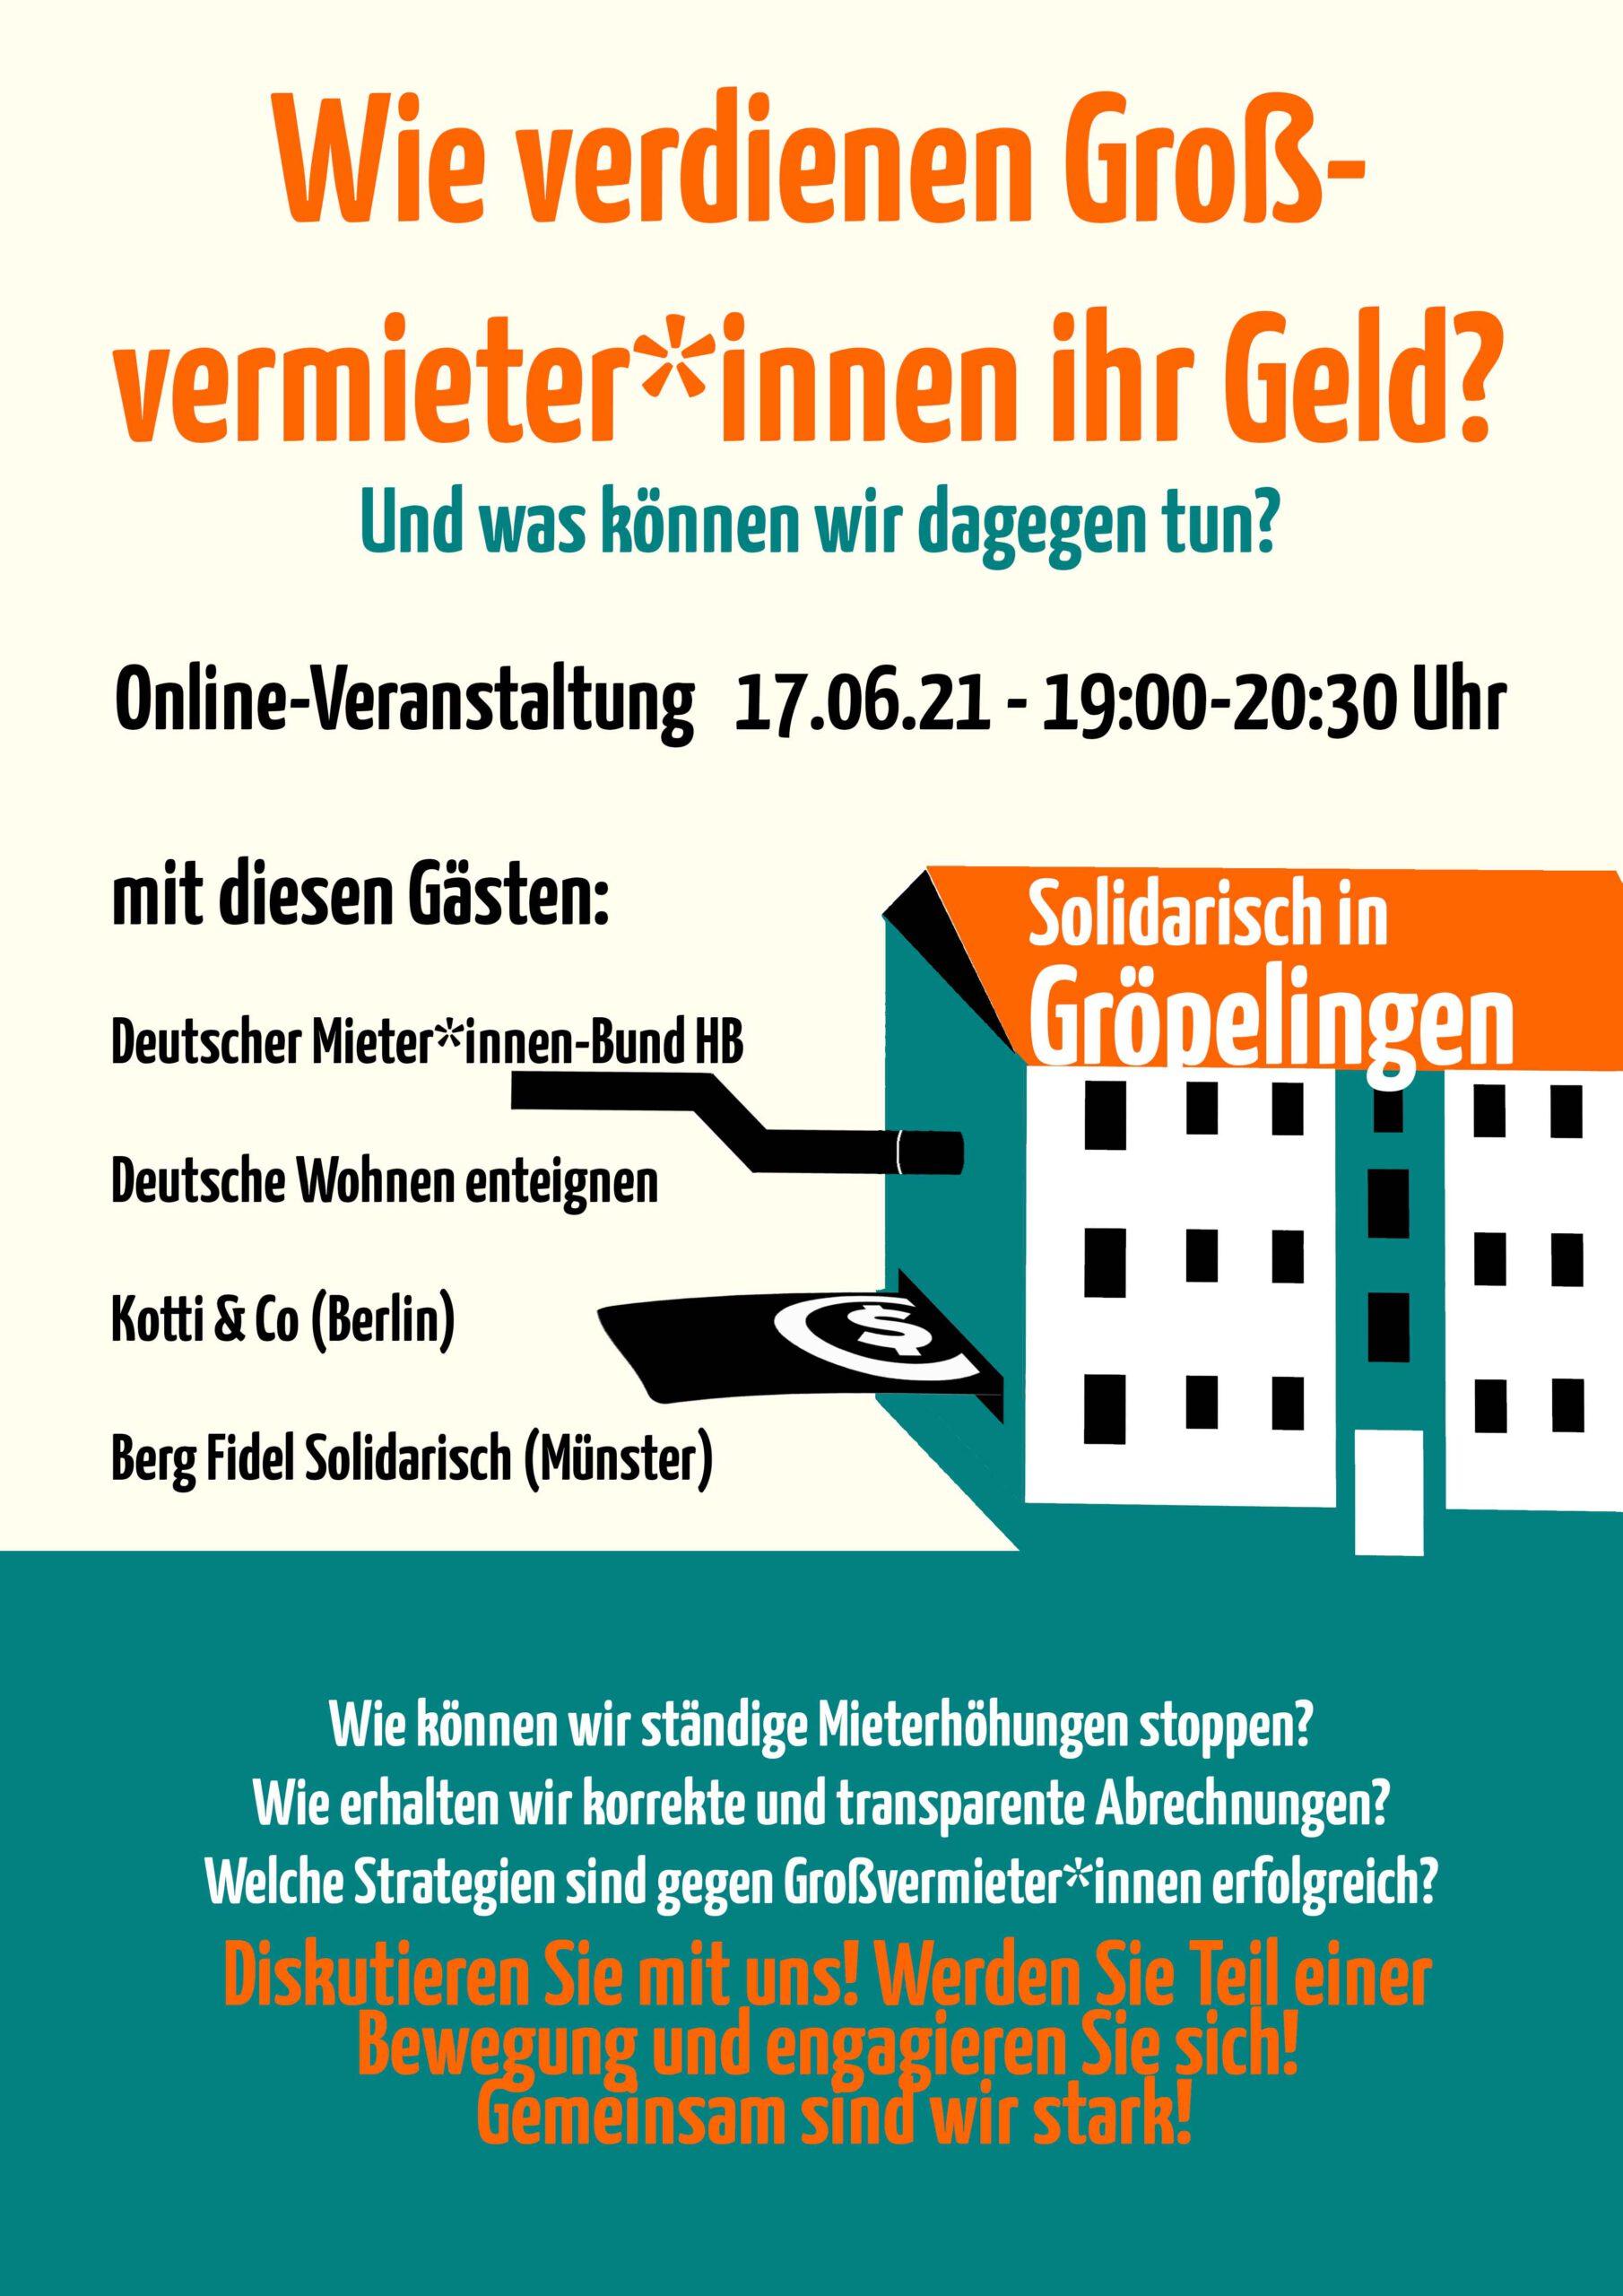 Erste Online-Veranstaltung am 17.06.21 / Thema: Mietpolitik